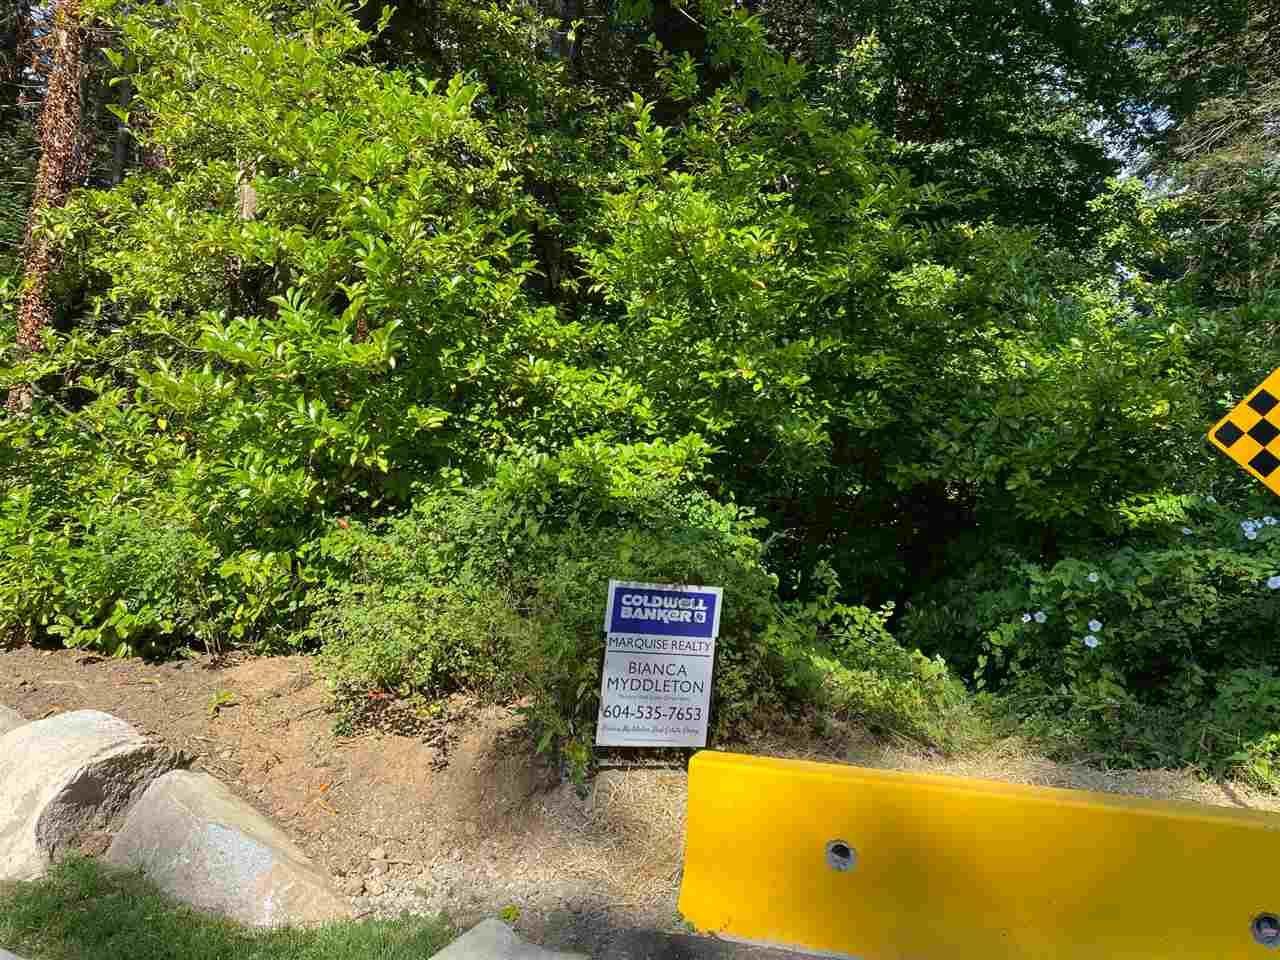 Main Photo: 12755 14 Avenue in Surrey: Crescent Bch Ocean Pk. Land for sale (South Surrey White Rock)  : MLS®# R2479842